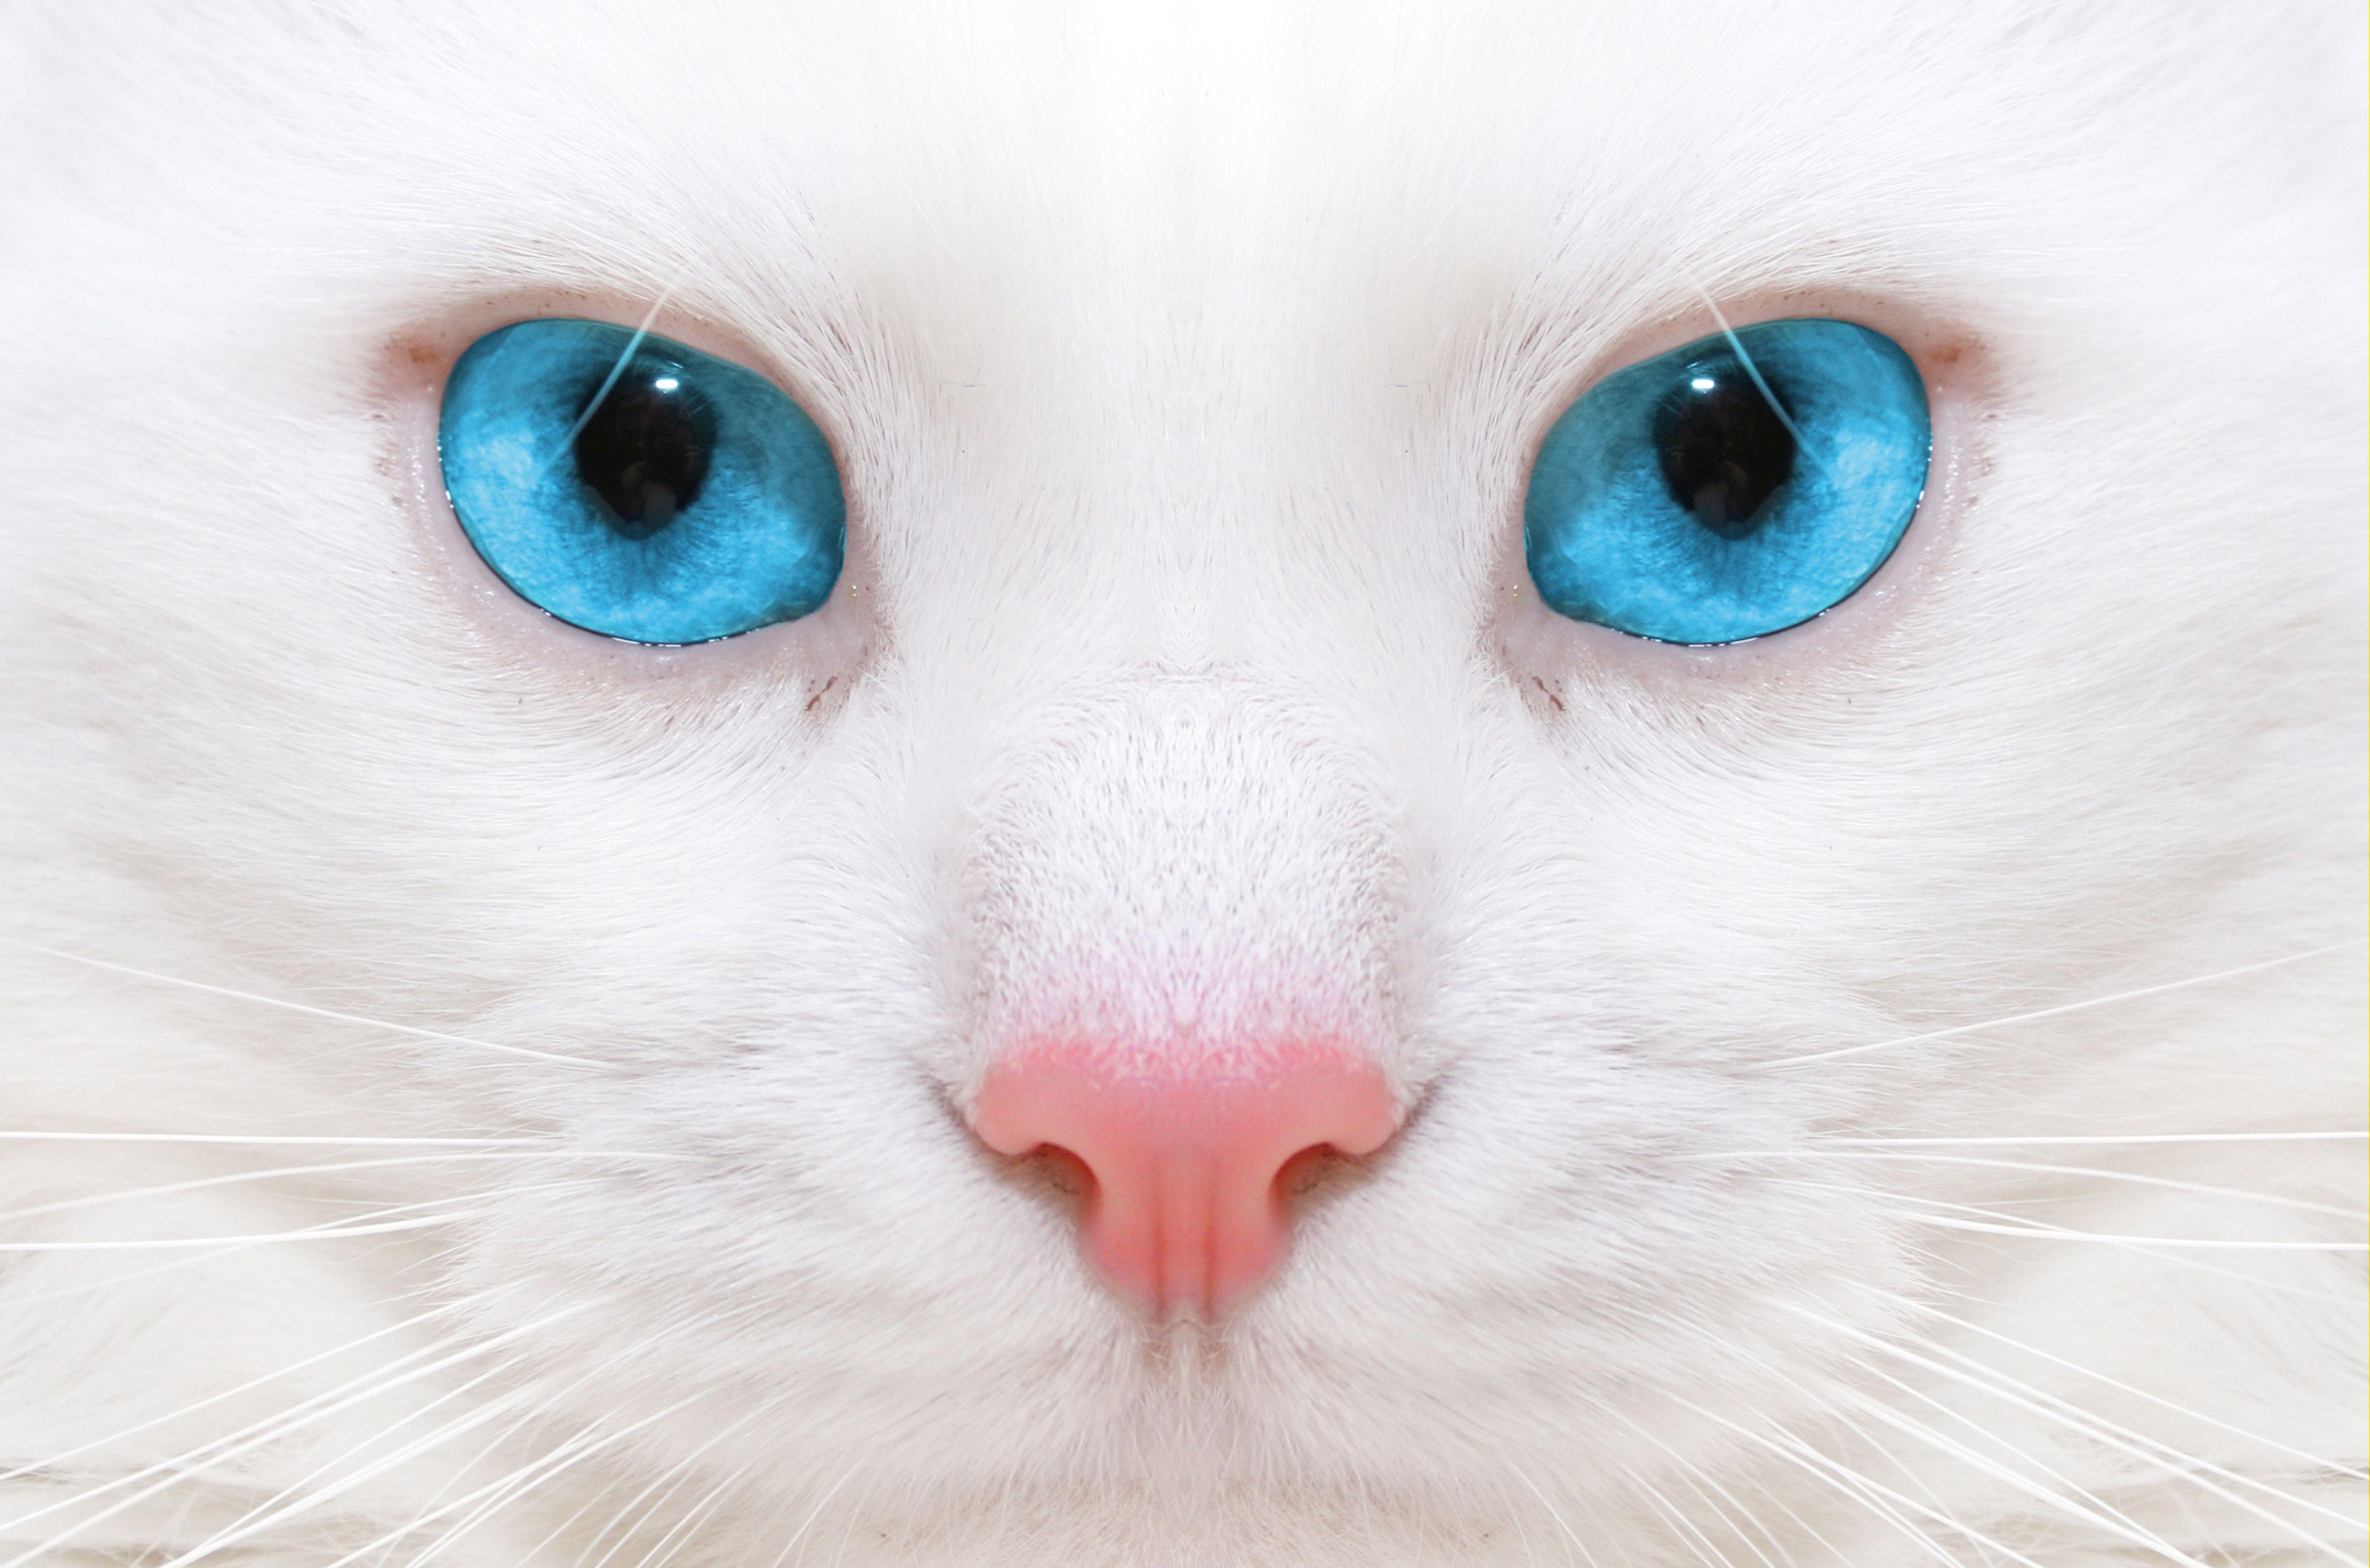 5196x3438 قطة بيضاء بعيون زرقاء عن قرب ورق حائط وصورة - ورق حائط